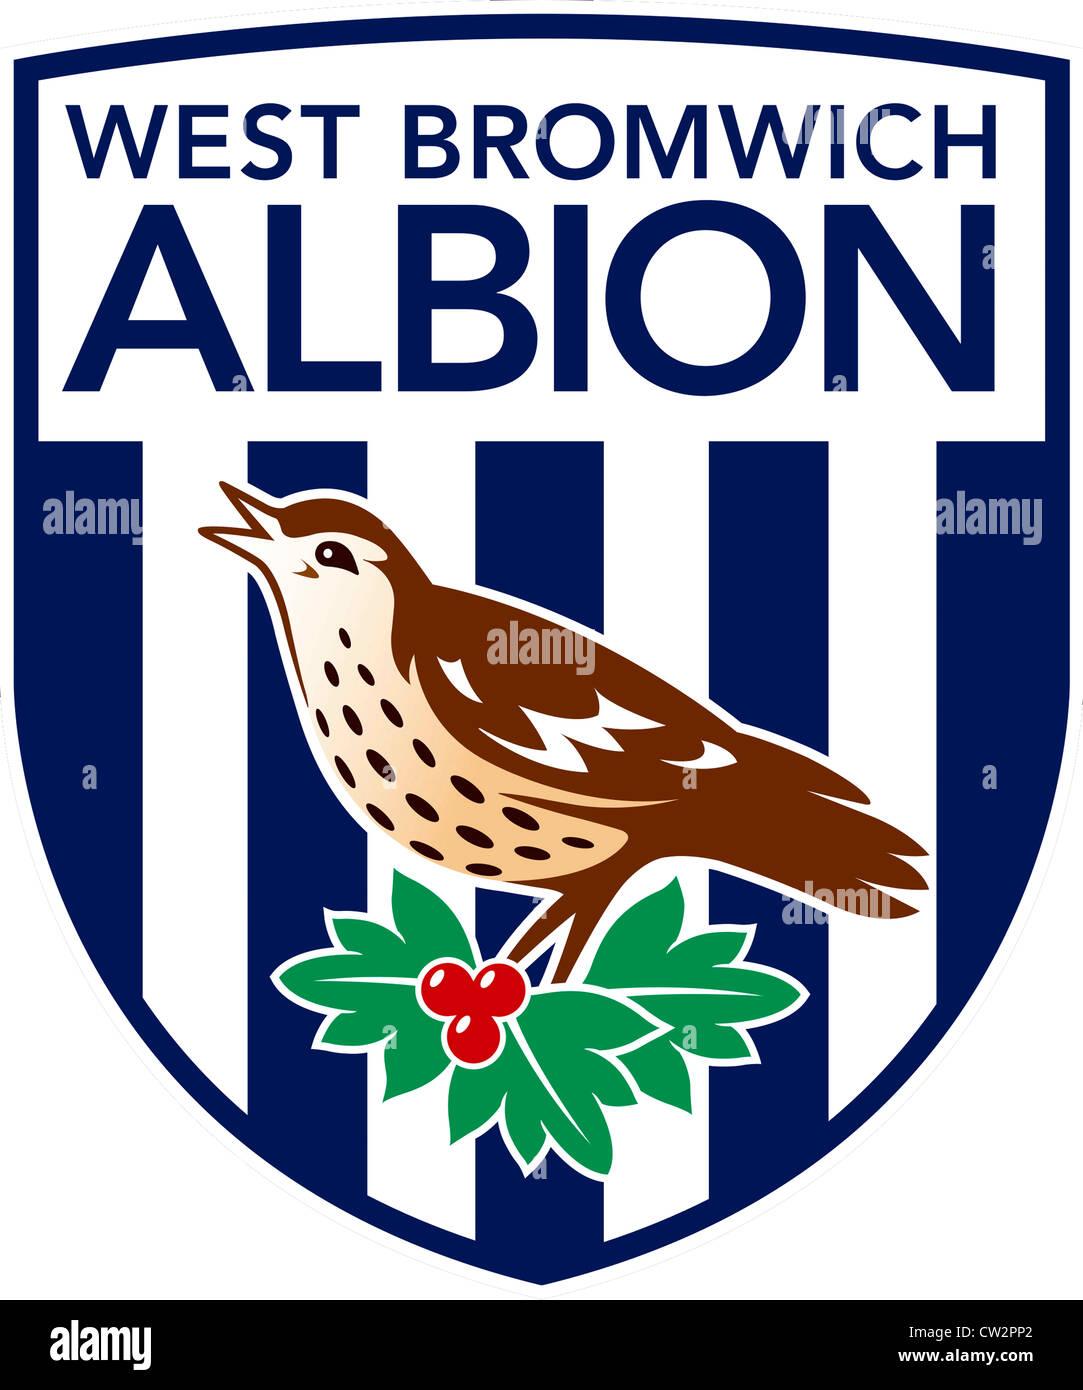 Football teams logos